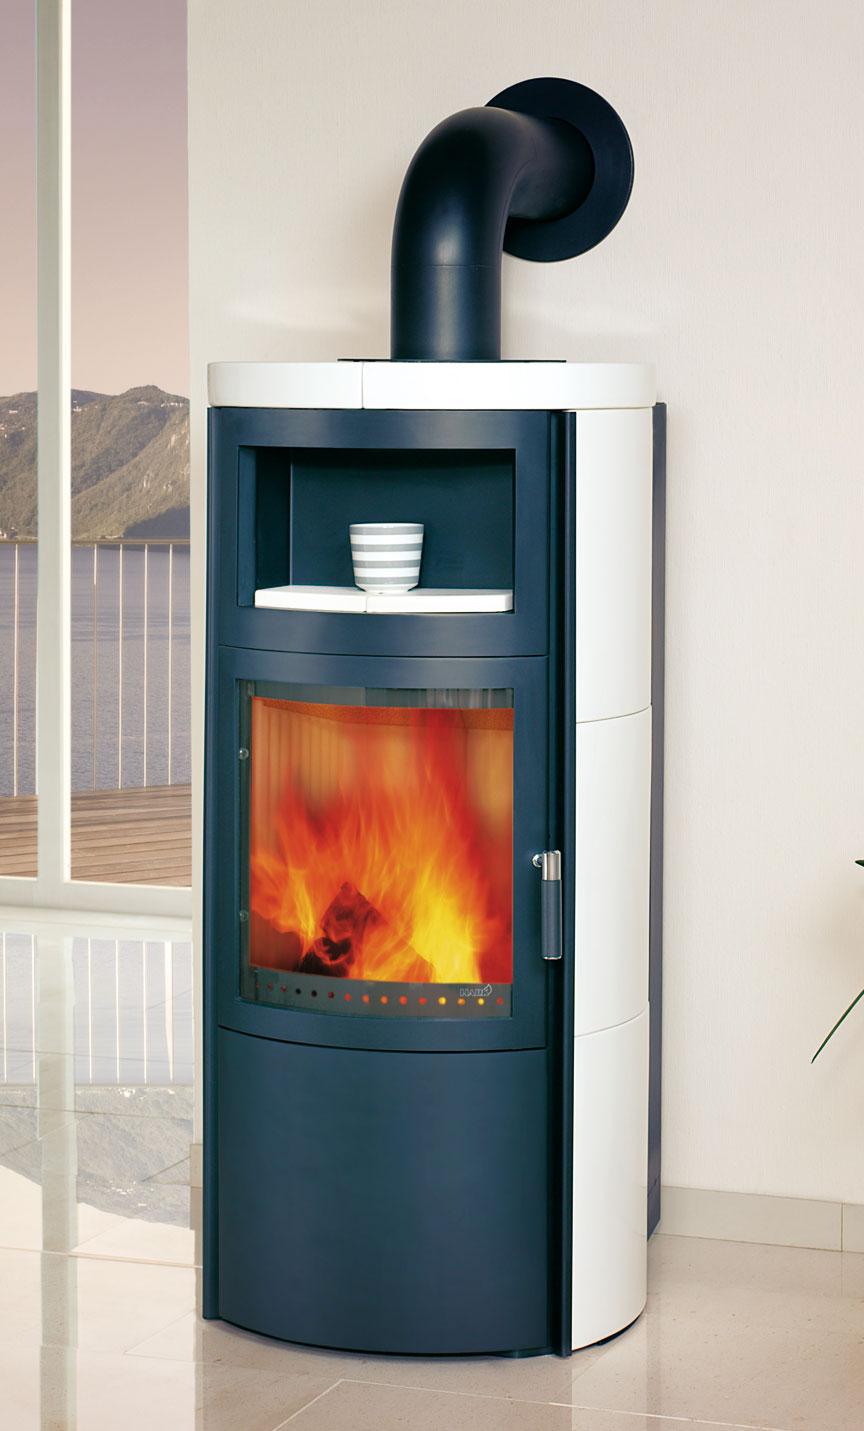 kaminofen dauerbrandofen hark vito ww ecoplus creme weiss 8 4kw bei. Black Bedroom Furniture Sets. Home Design Ideas